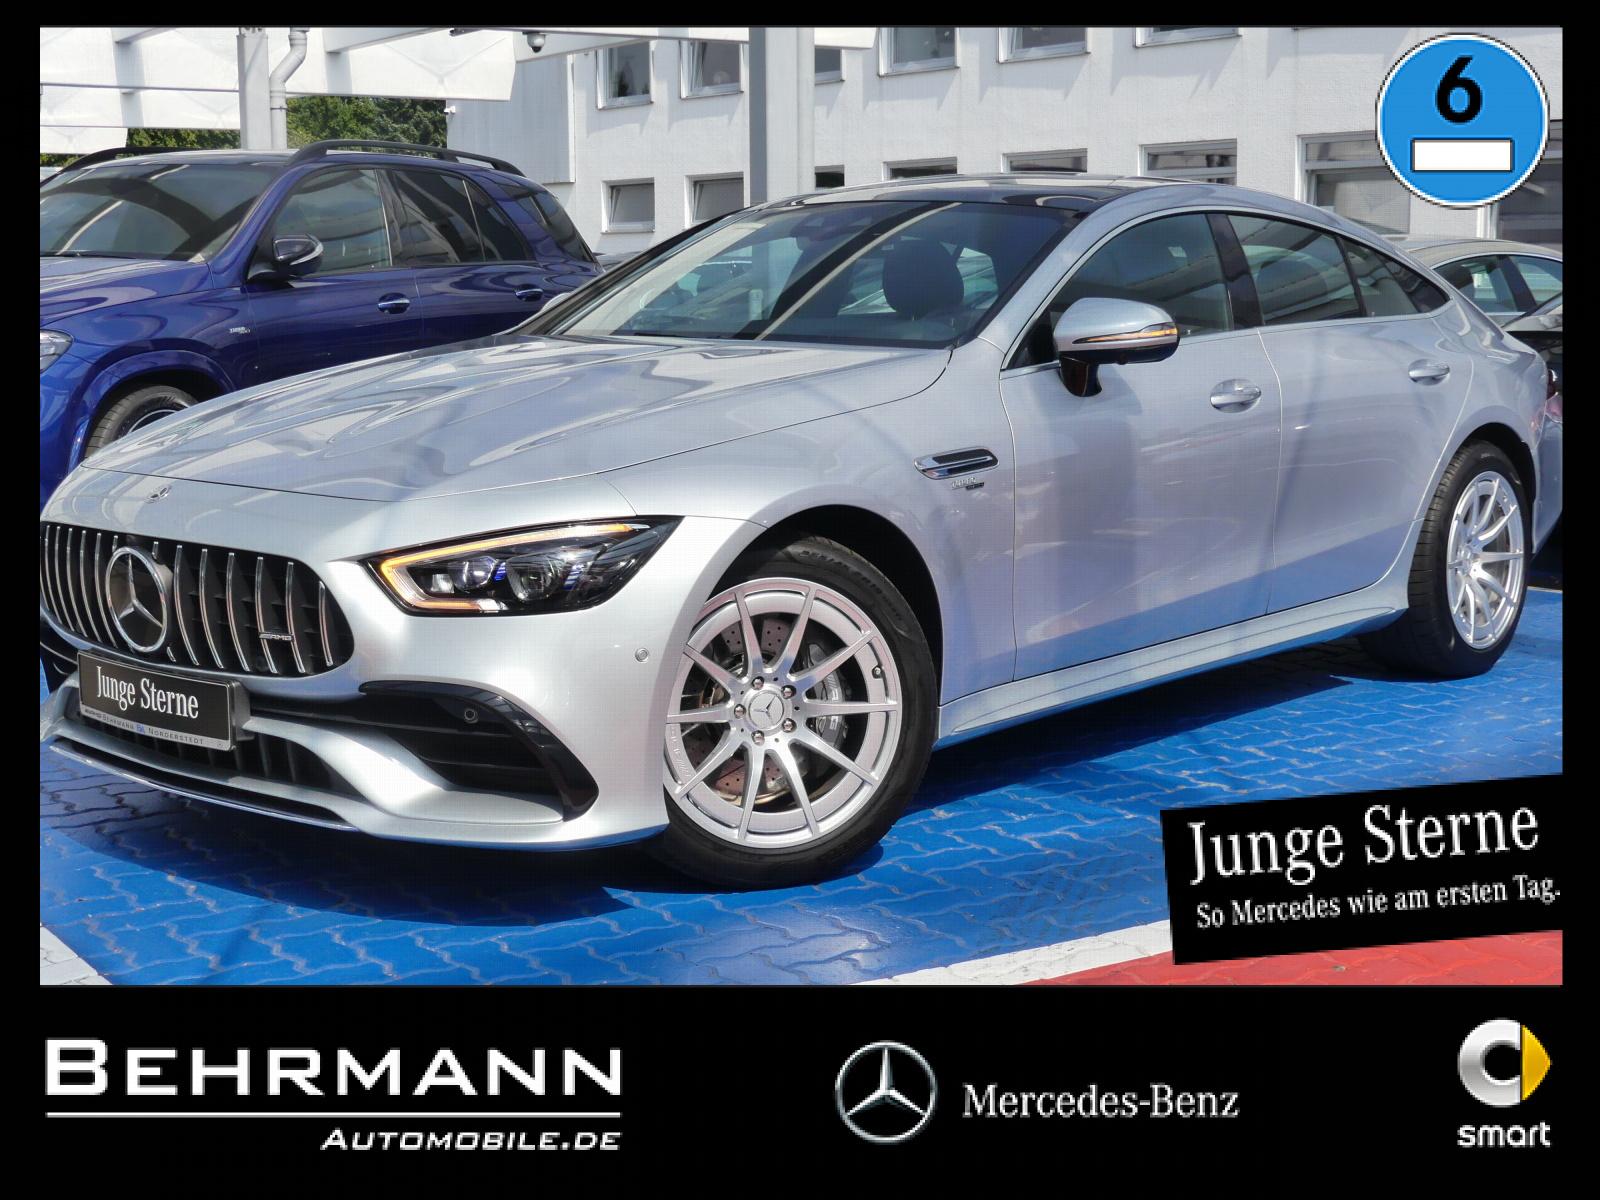 Mercedes-Benz AMG GT 43 4M +360°Kam+Distronic+AHK+StdHzg.+LED, Jahr 2020, Benzin